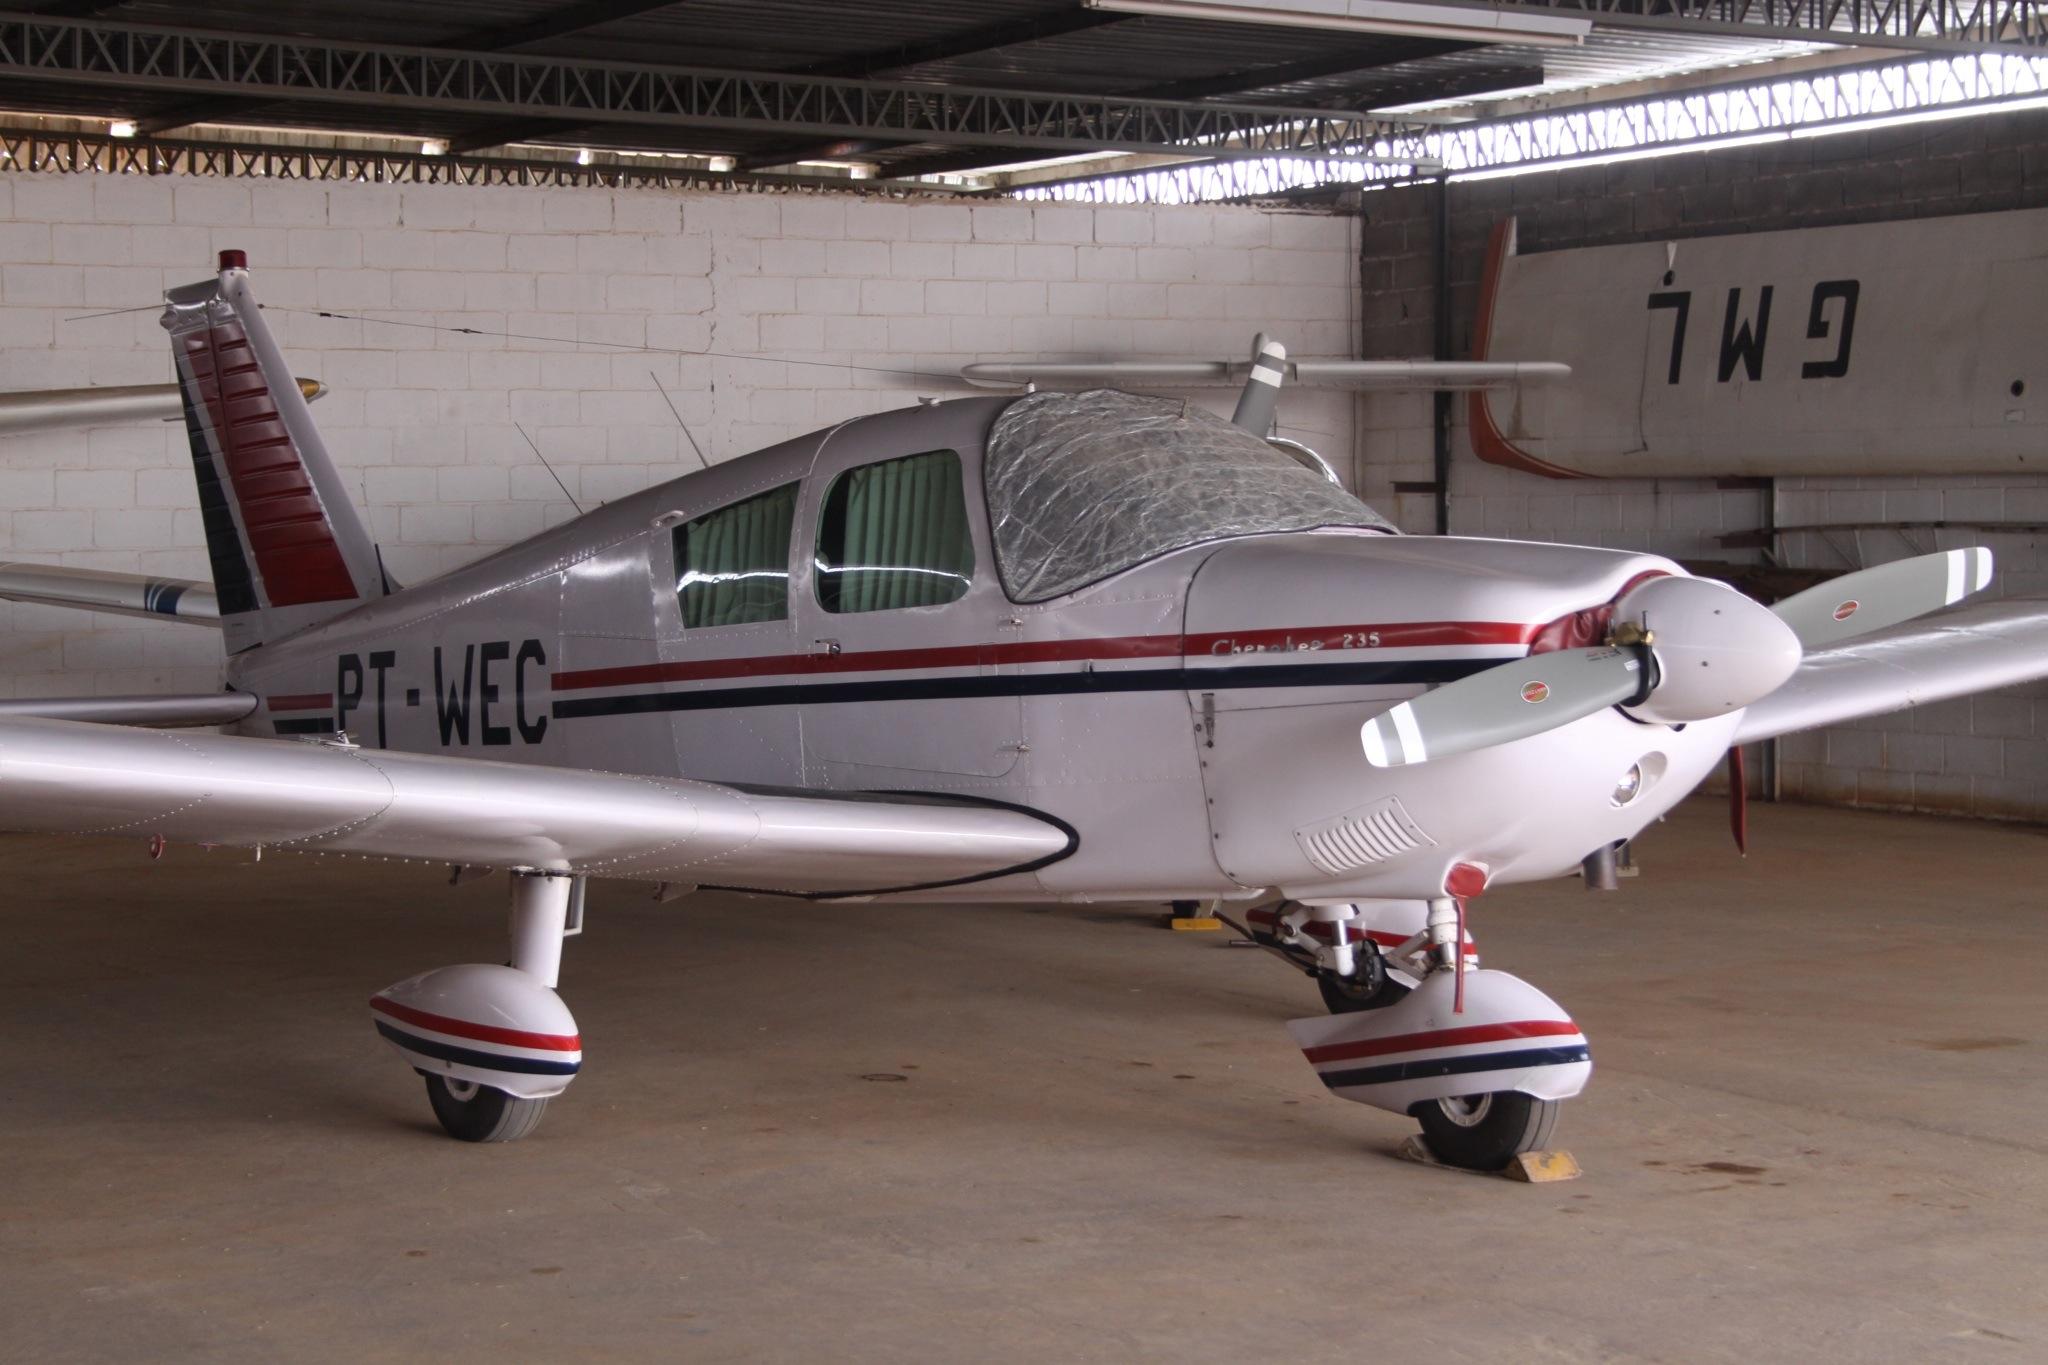 File:PT-WEC Piper PA-28-235 Cherokee (8181553394) jpg